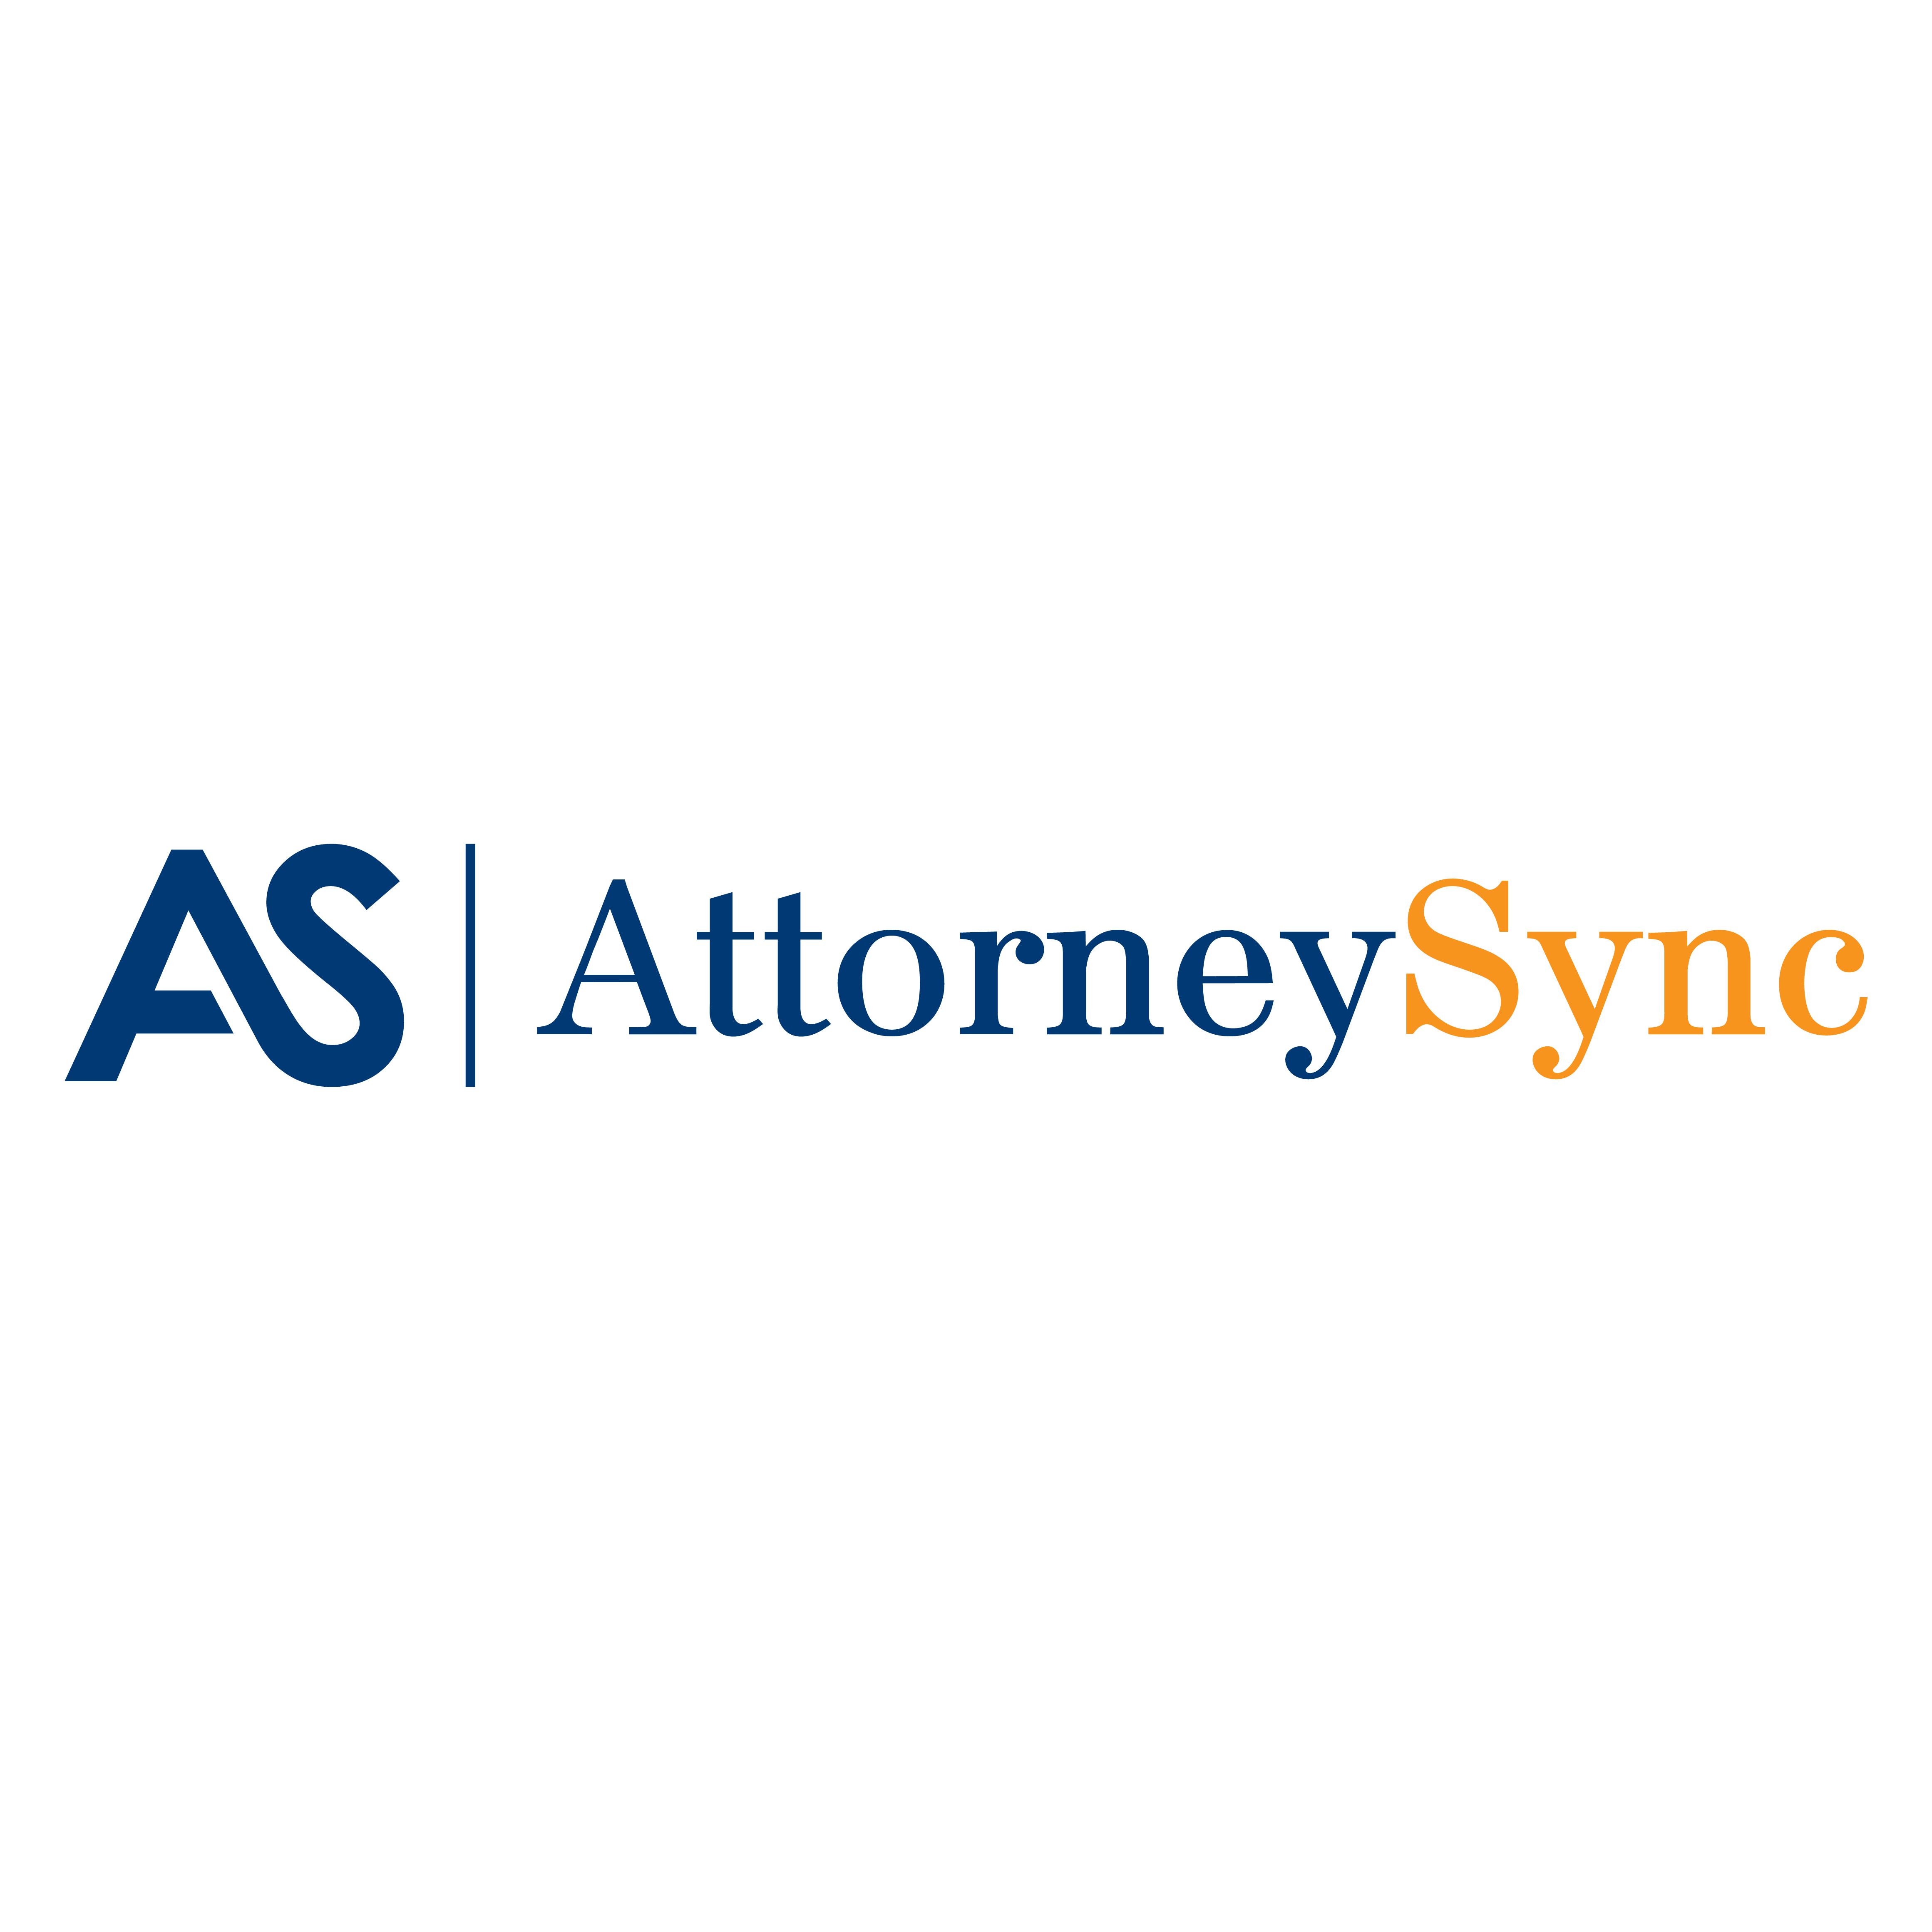 AttorneySync